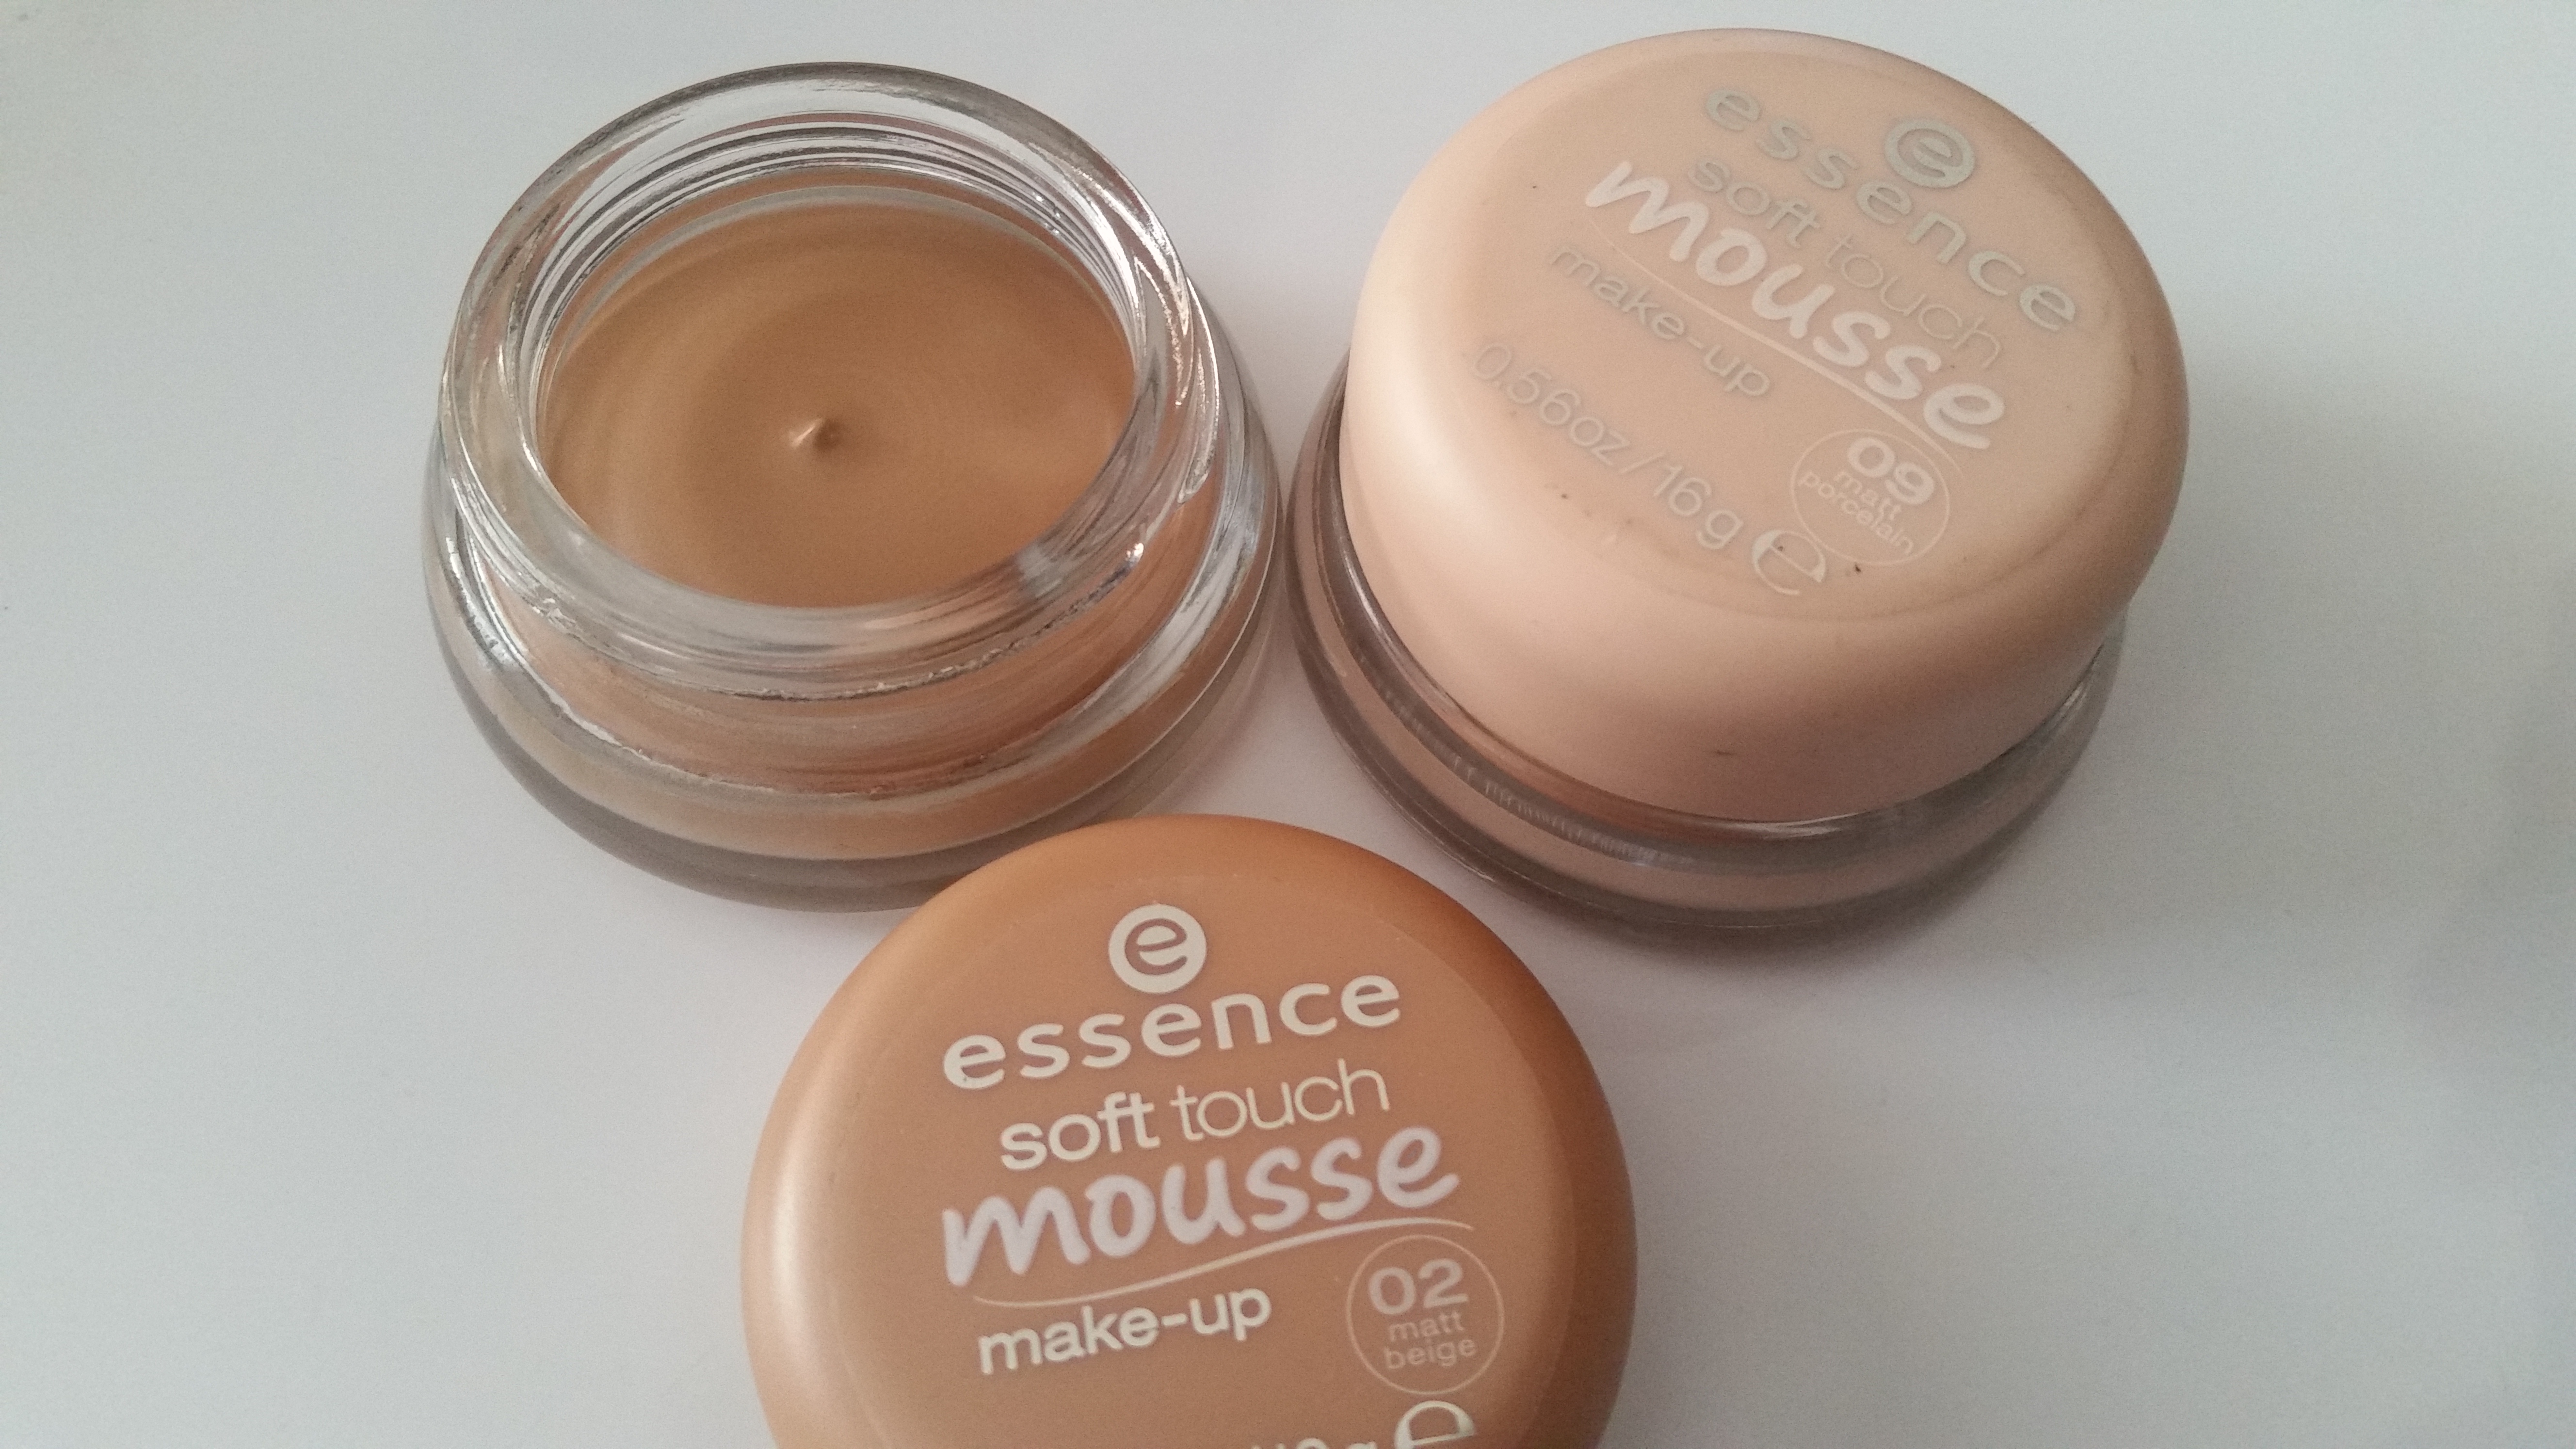 Https About Poutperfectionfileswordpress Moko Sweet Matte Lip Creme Nude Metal 20150607 095644